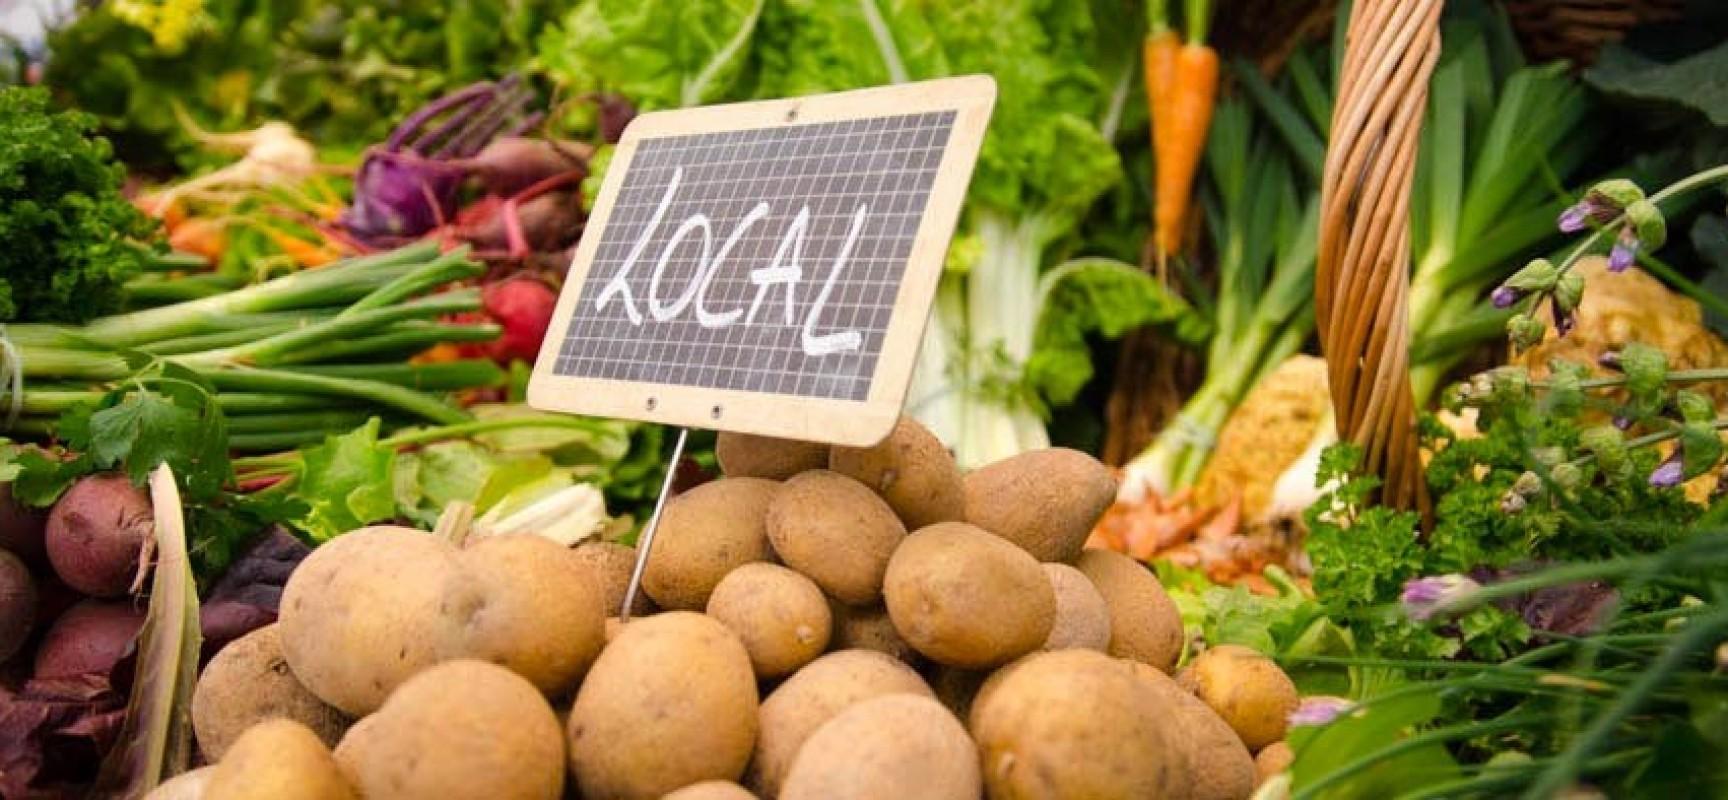 Restauration collective : animations sur l'alimentation locale